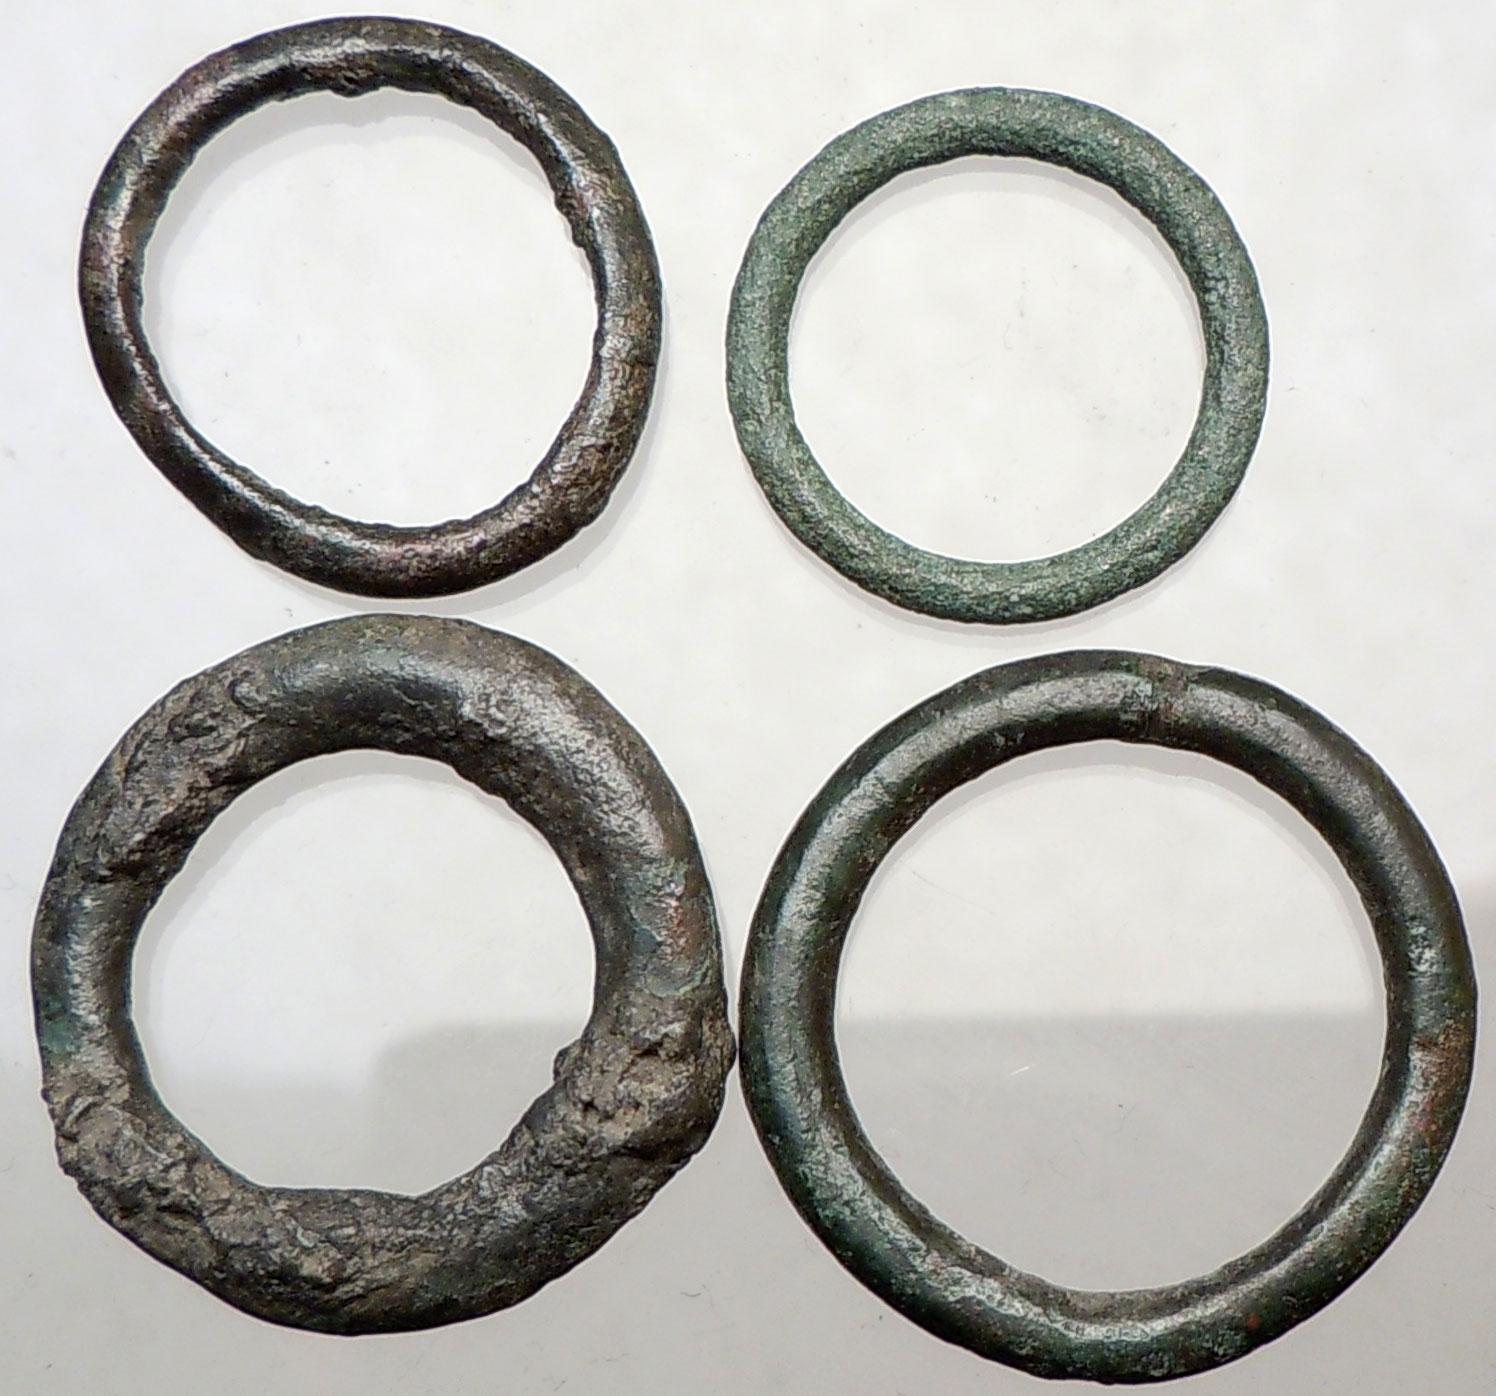 celtic 800bc ancient authentic genuine ring money proto